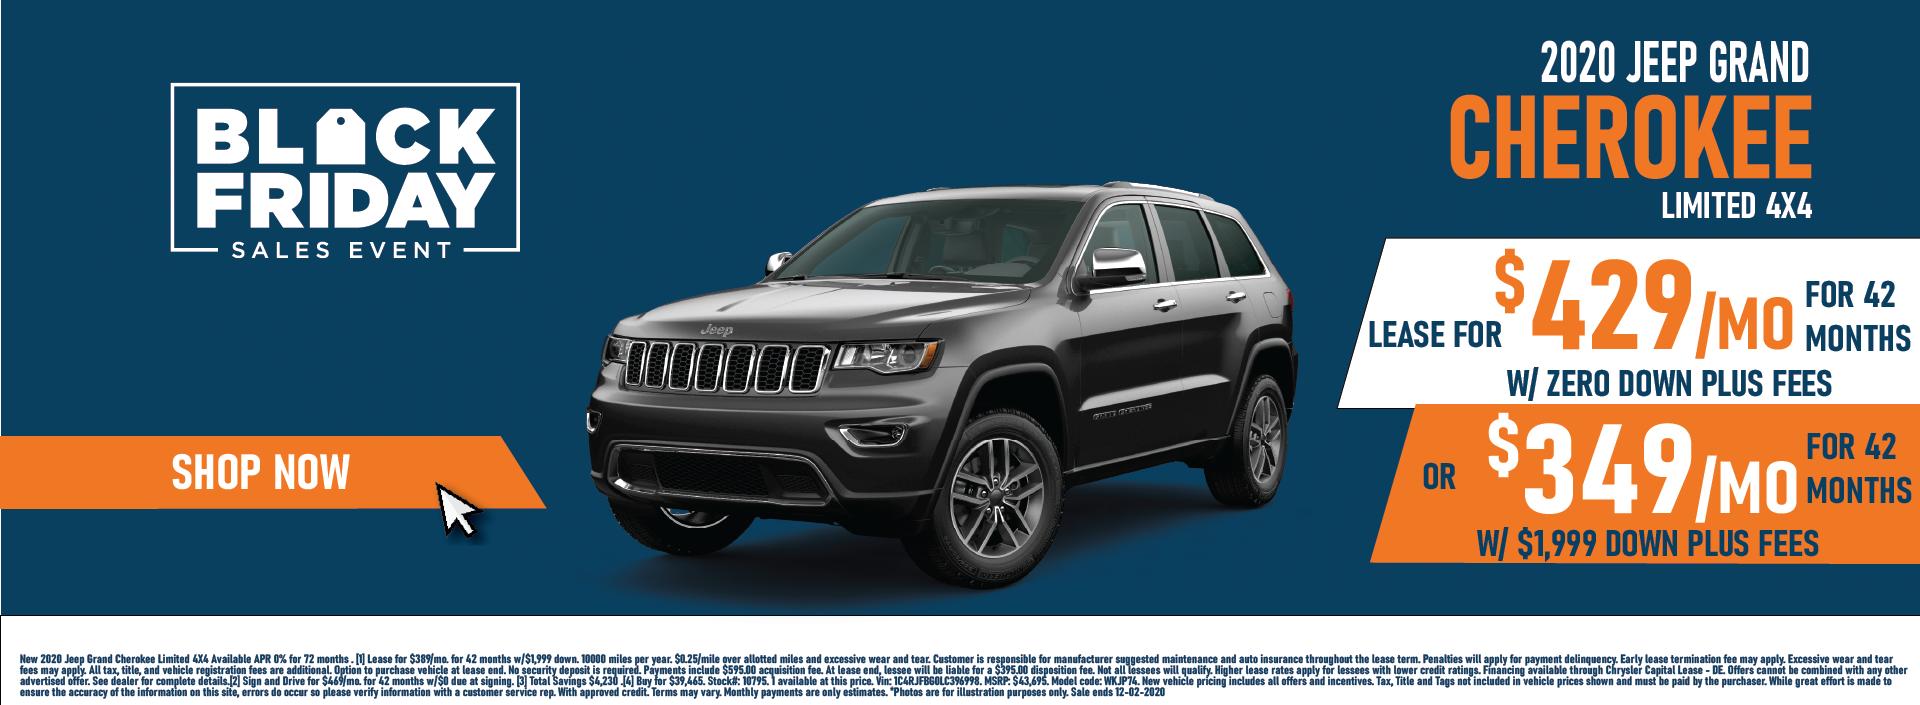 Whitewater – Jeep Grand Cherokee November Updated Again